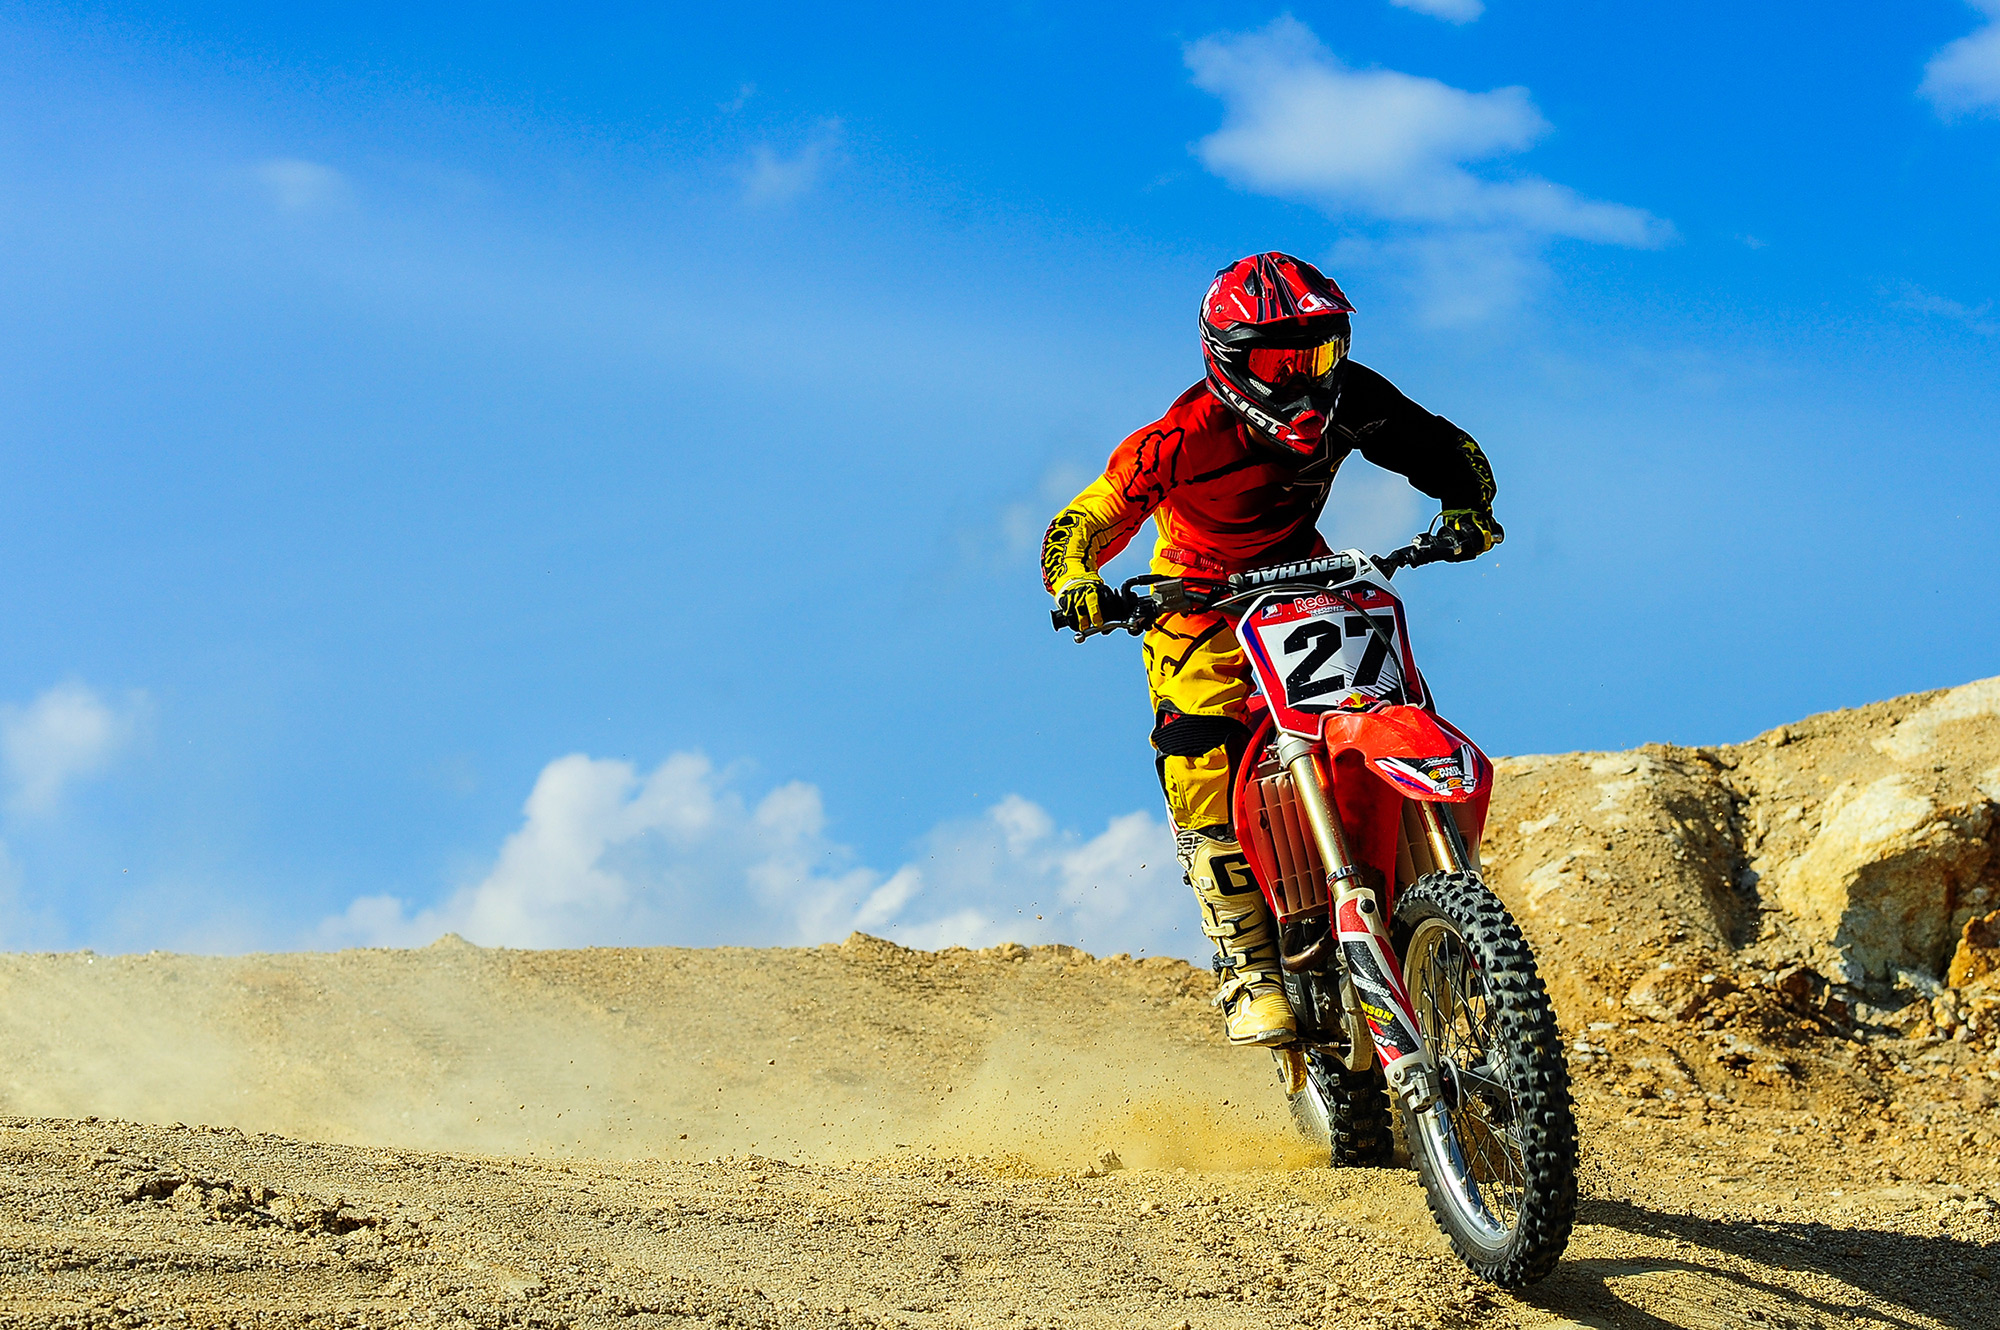 Person Driving Motocross Dirt Bike Under Blue Sky